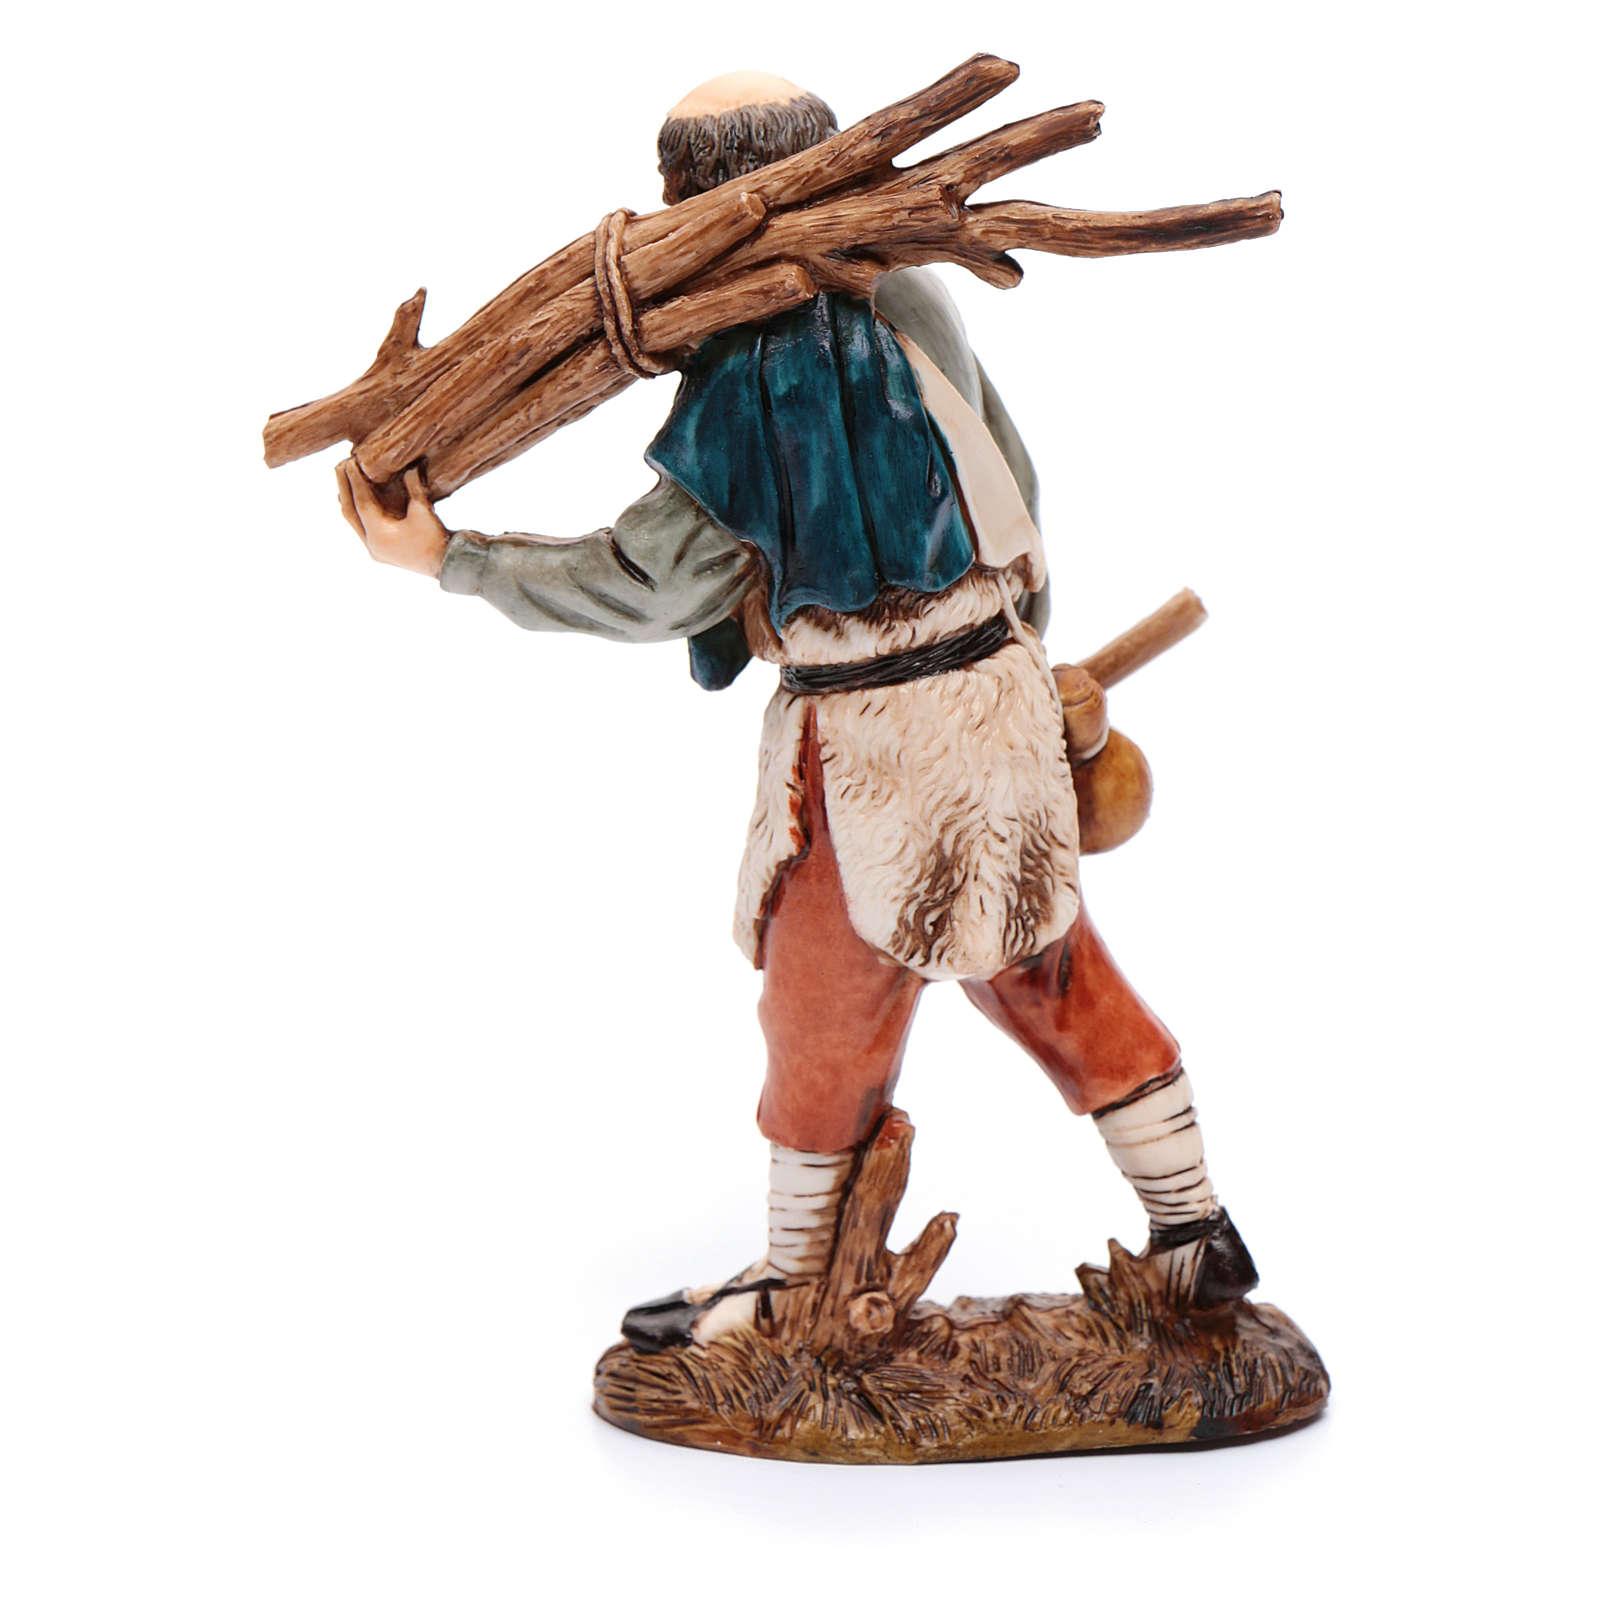 Woodcutter 12cm '700 style, Moranduzzo Nativity Scene 4